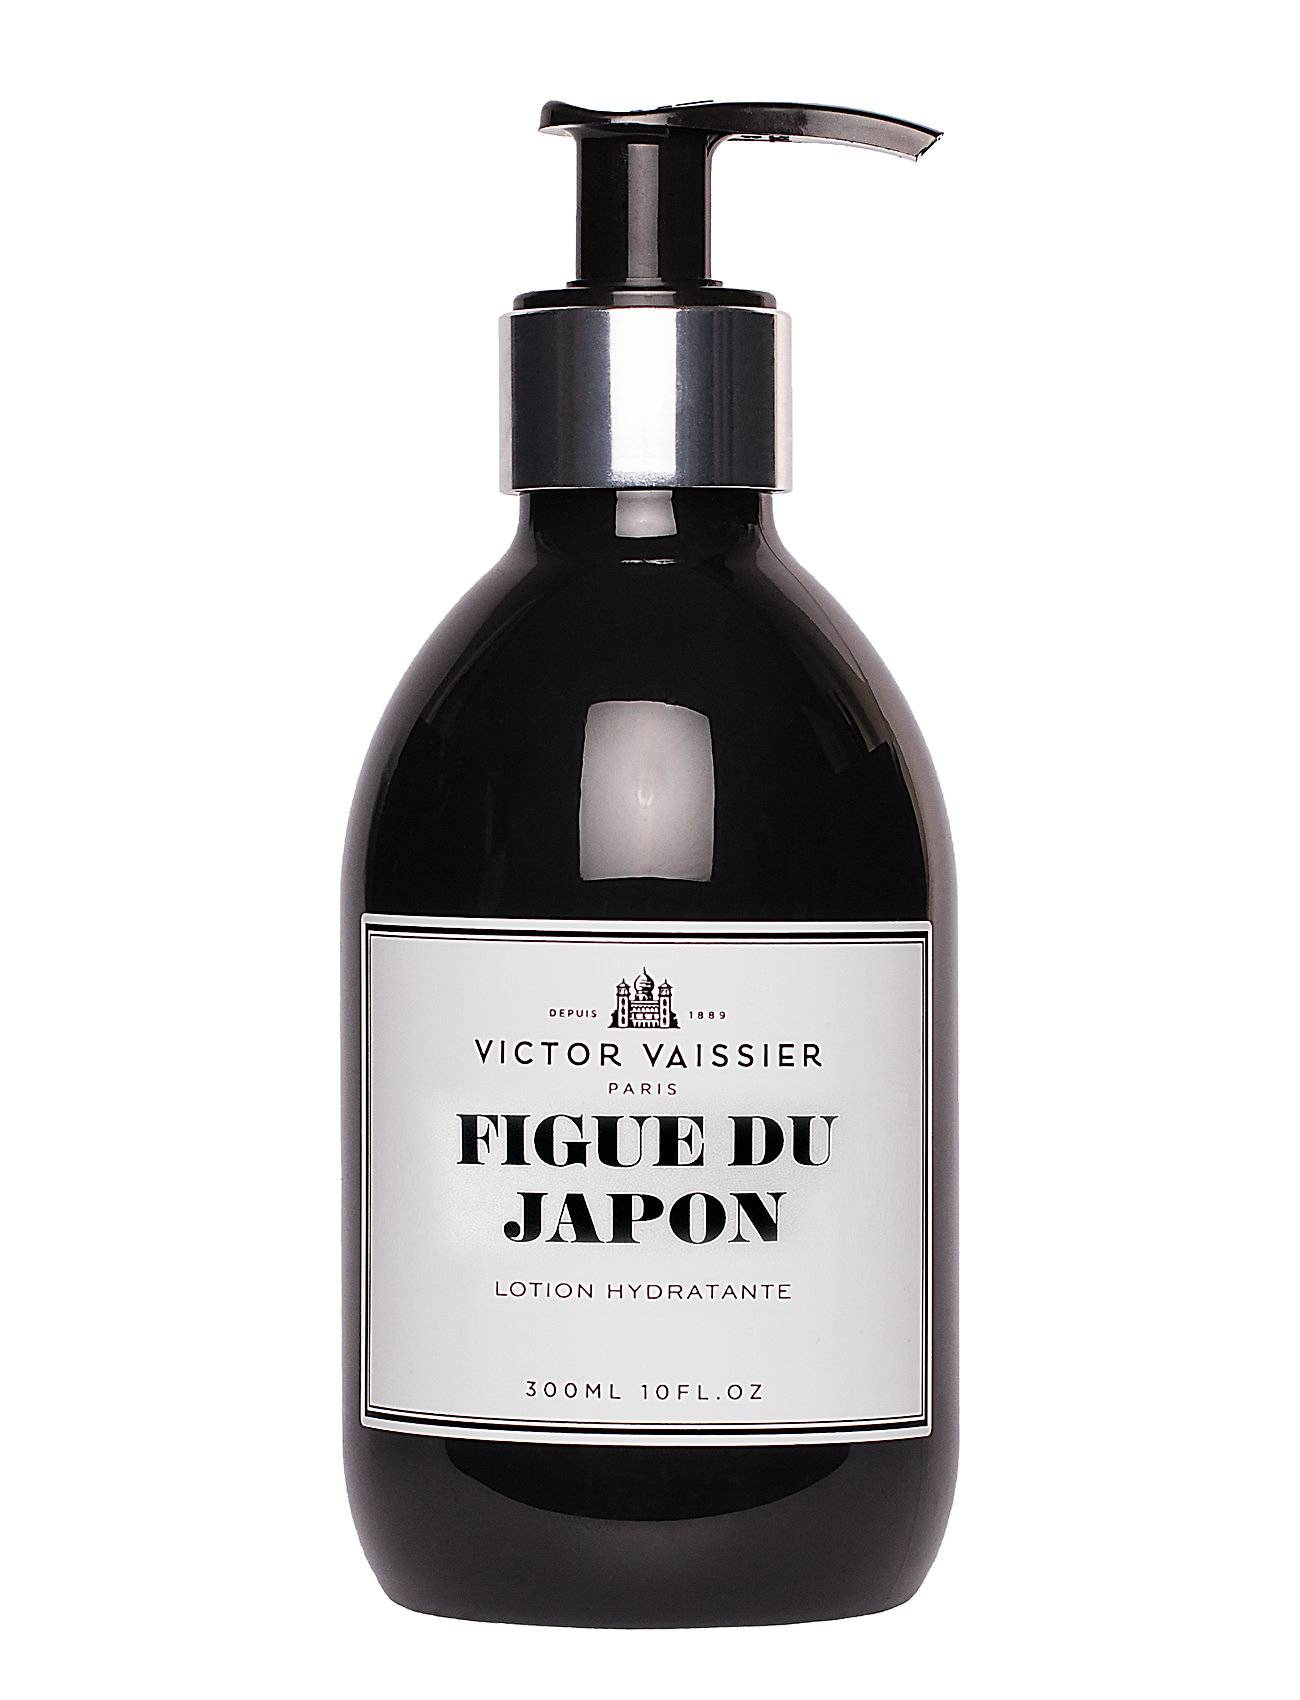 Victor Vaissier Hydrating Lotion Figue Du Japon Kosteusvoide Vartalo Nude Victor Vaissier